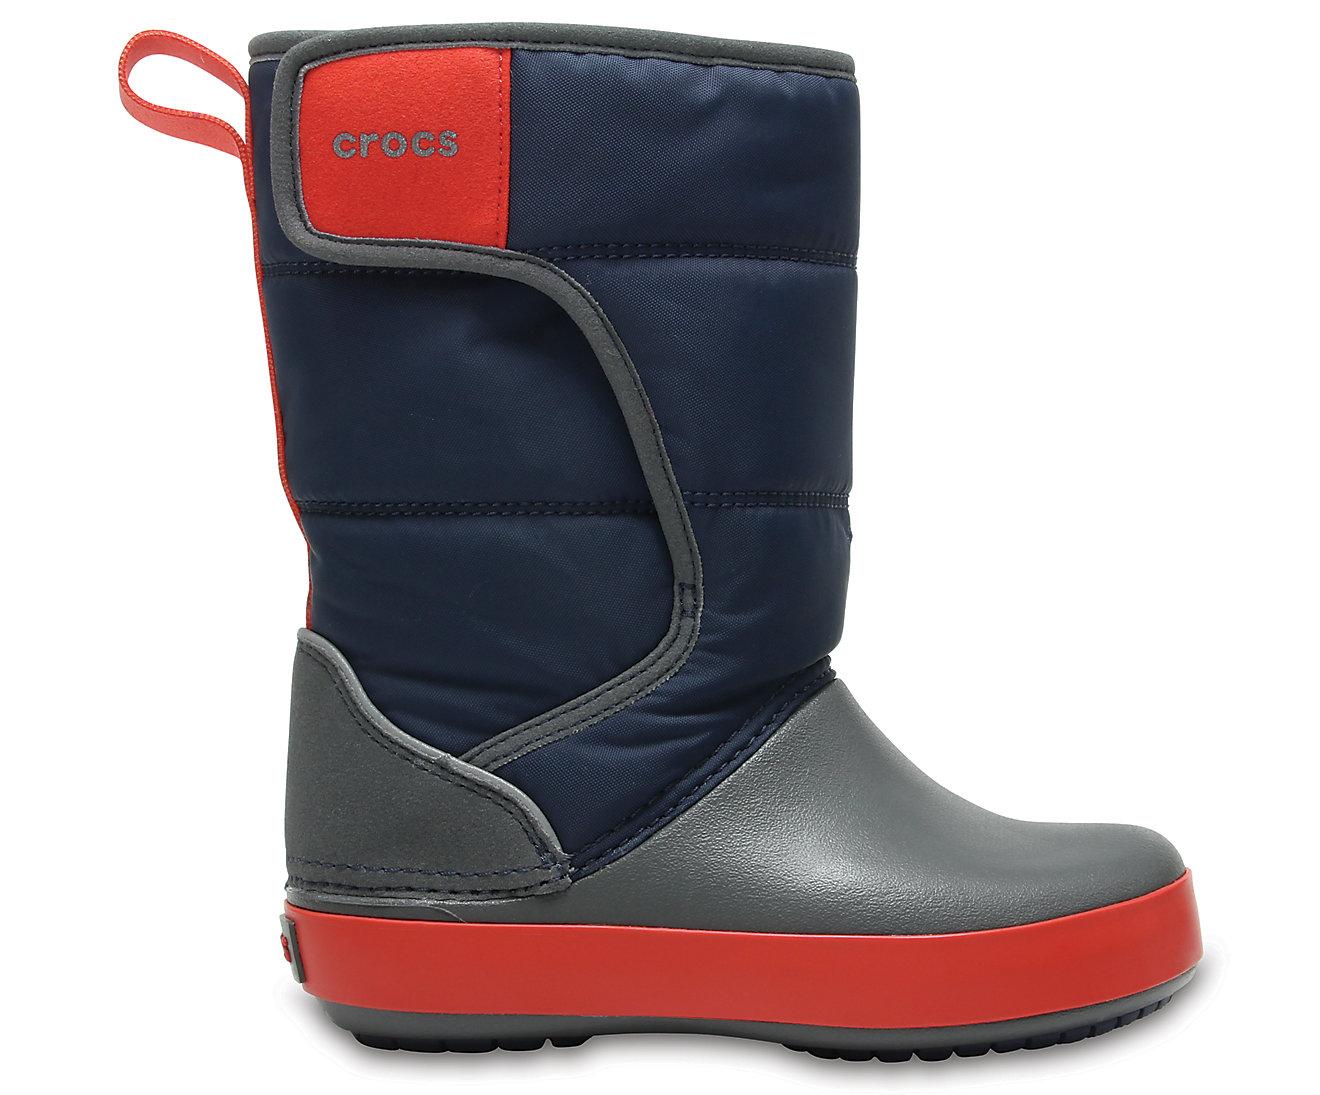 ... Snow Boot K Navy Slate Grey C10. -24%. Crocs LodgePoint ... 112d6ef3e1